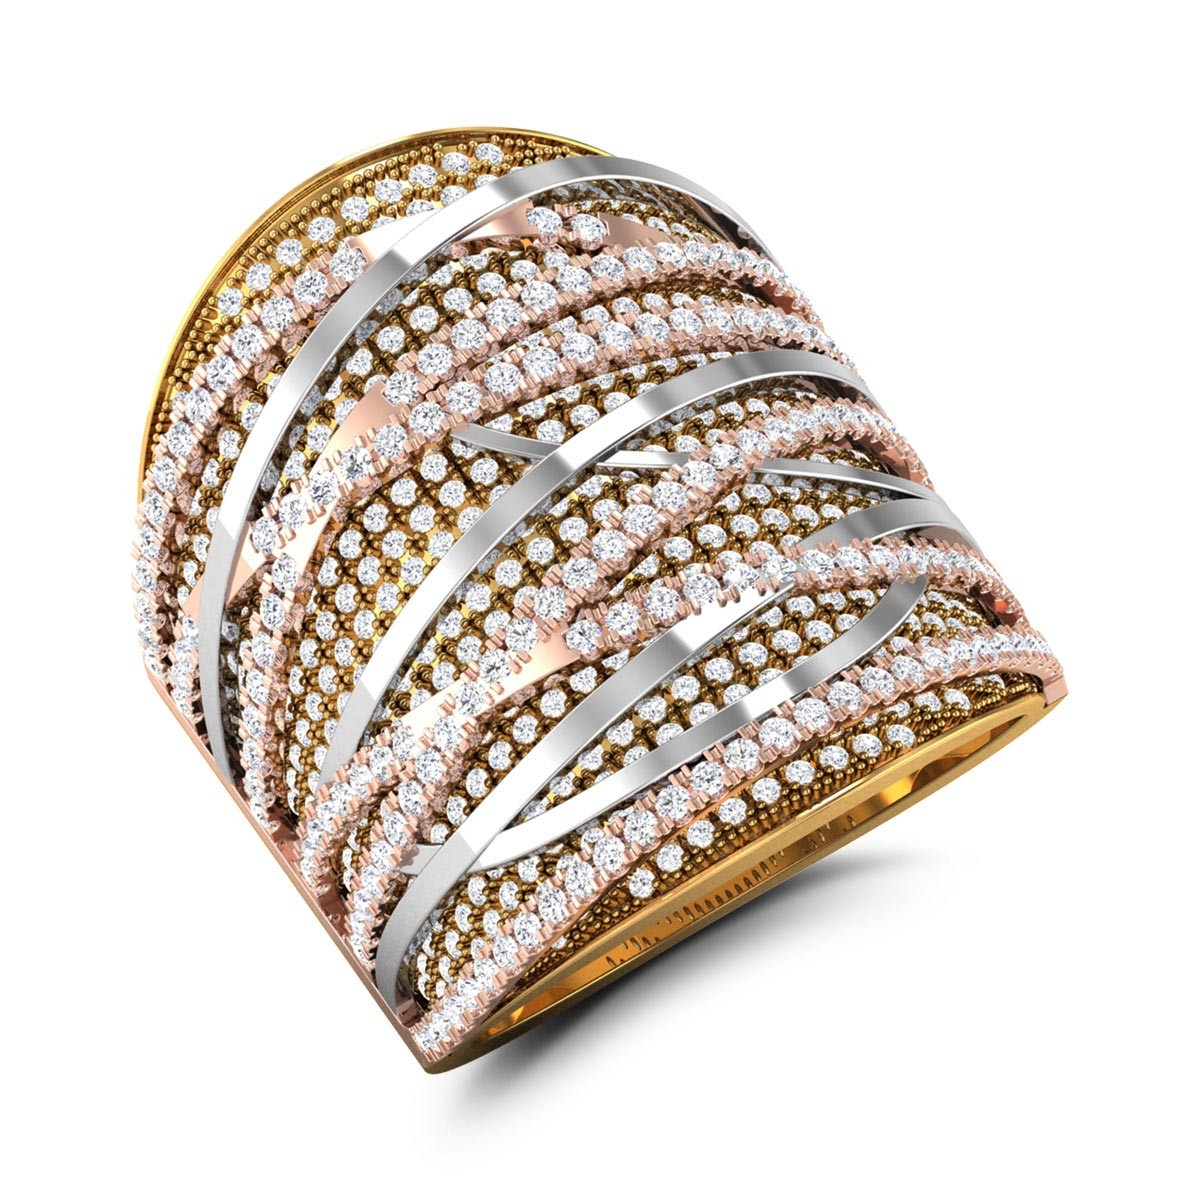 Branca Gold & CZ Ring